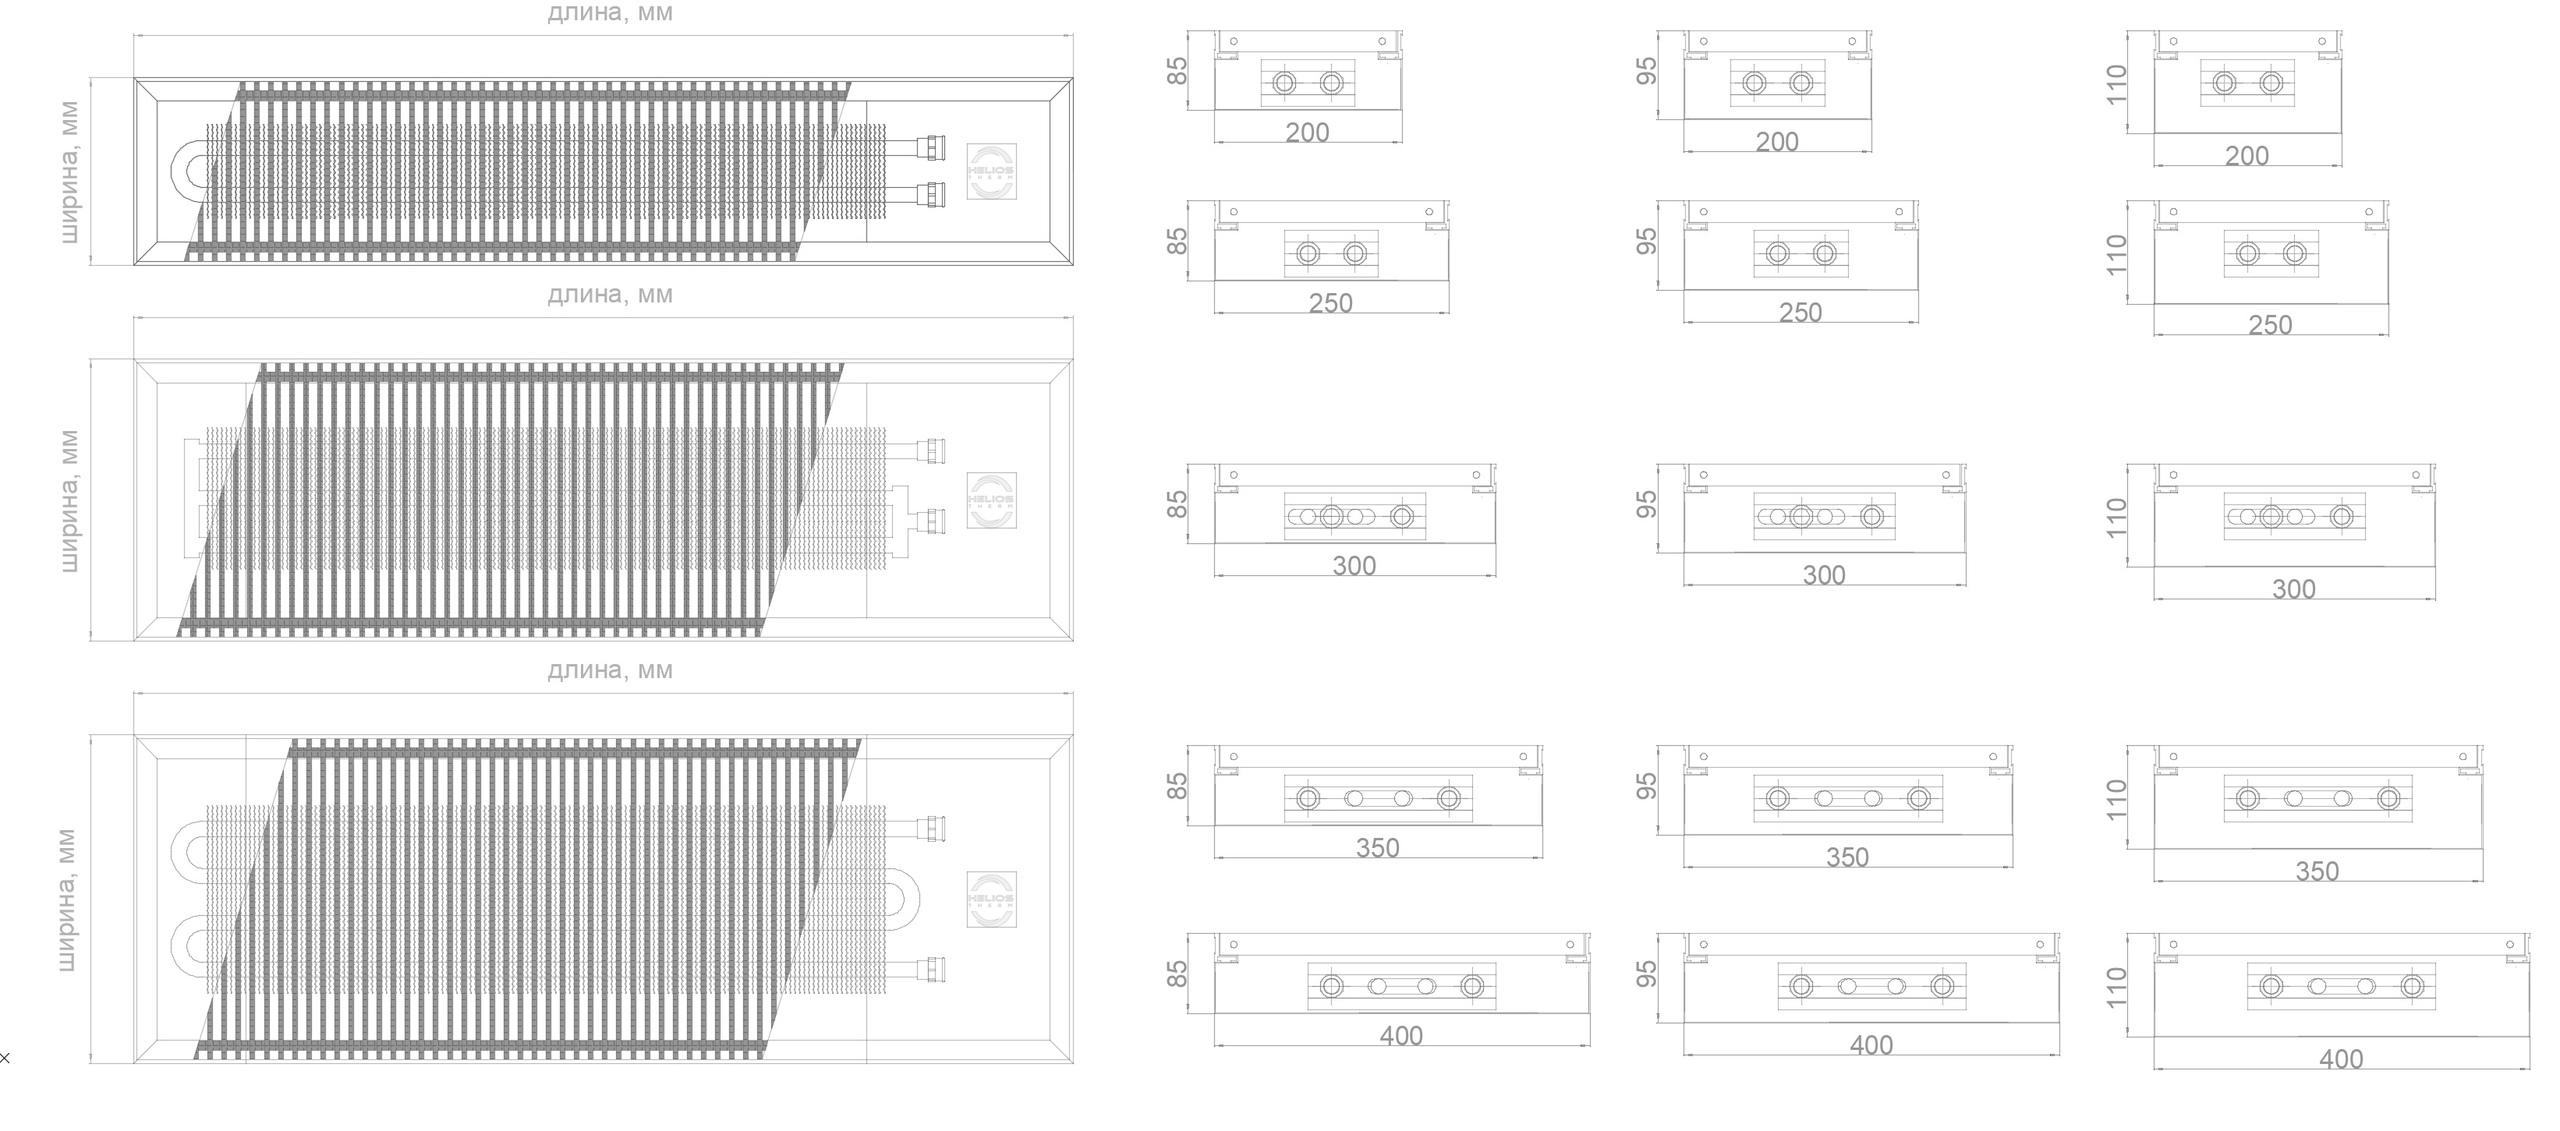 Схема конвектора CIA шириной 250 мм, 300 мм, 350 мм и 400 мм